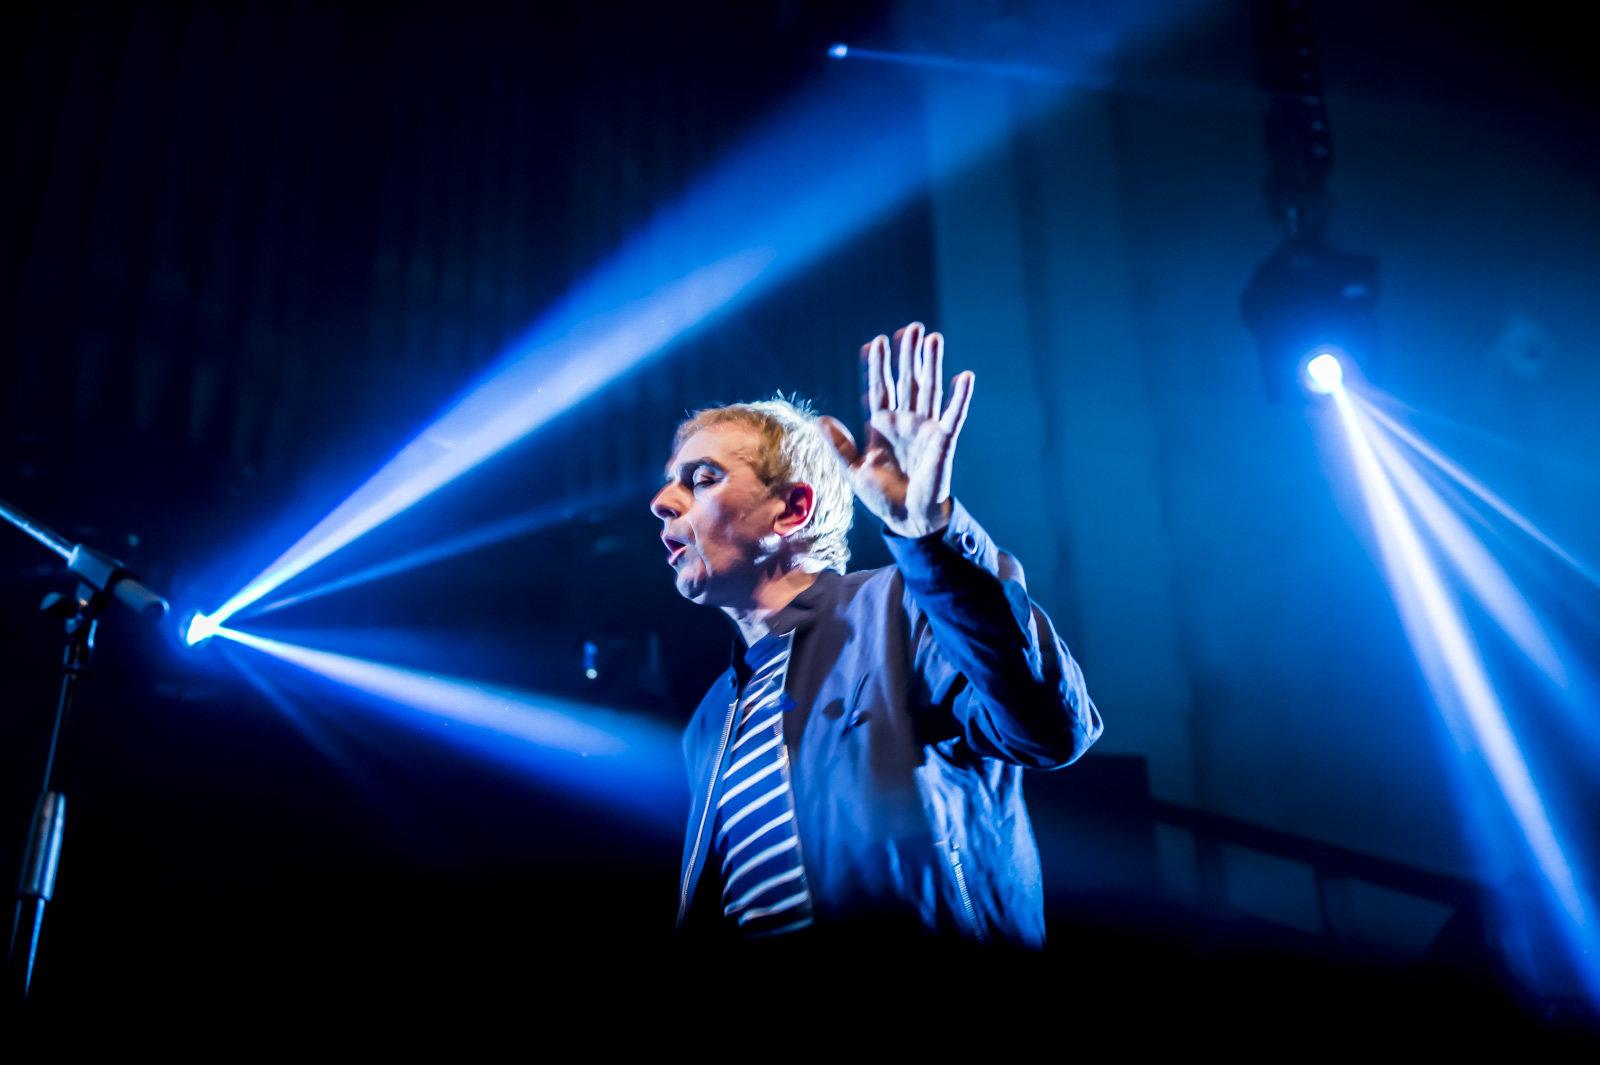 Karl in the Blue Light